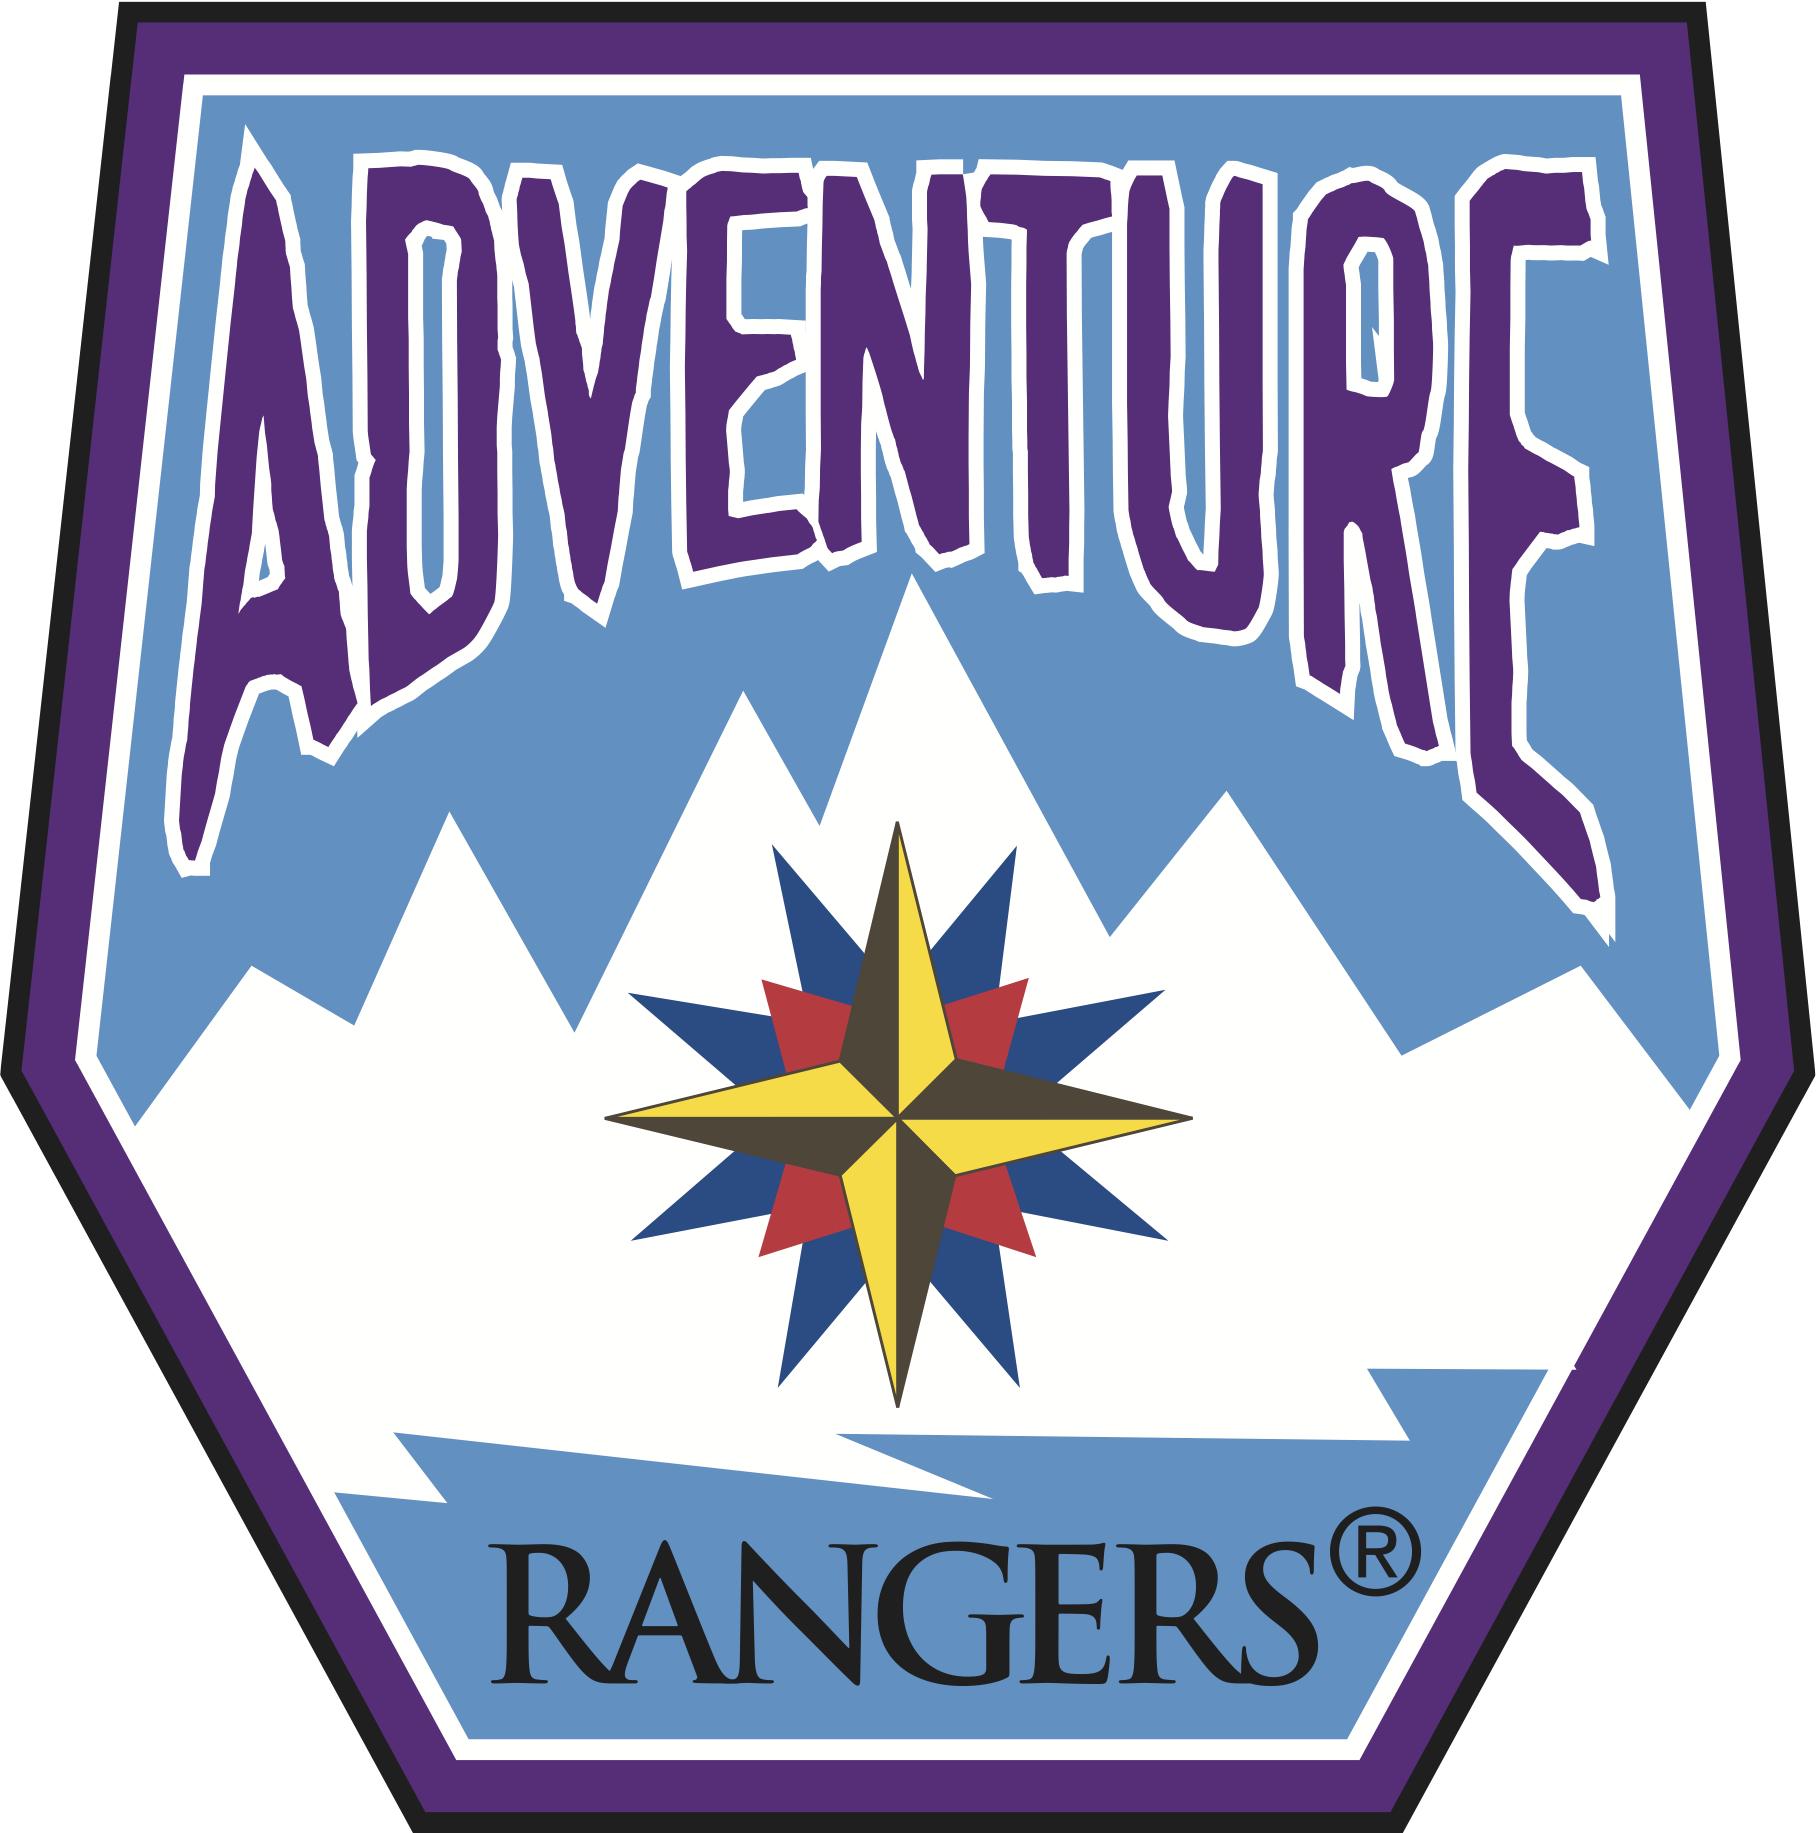 adventure rangers copy 2.jpg